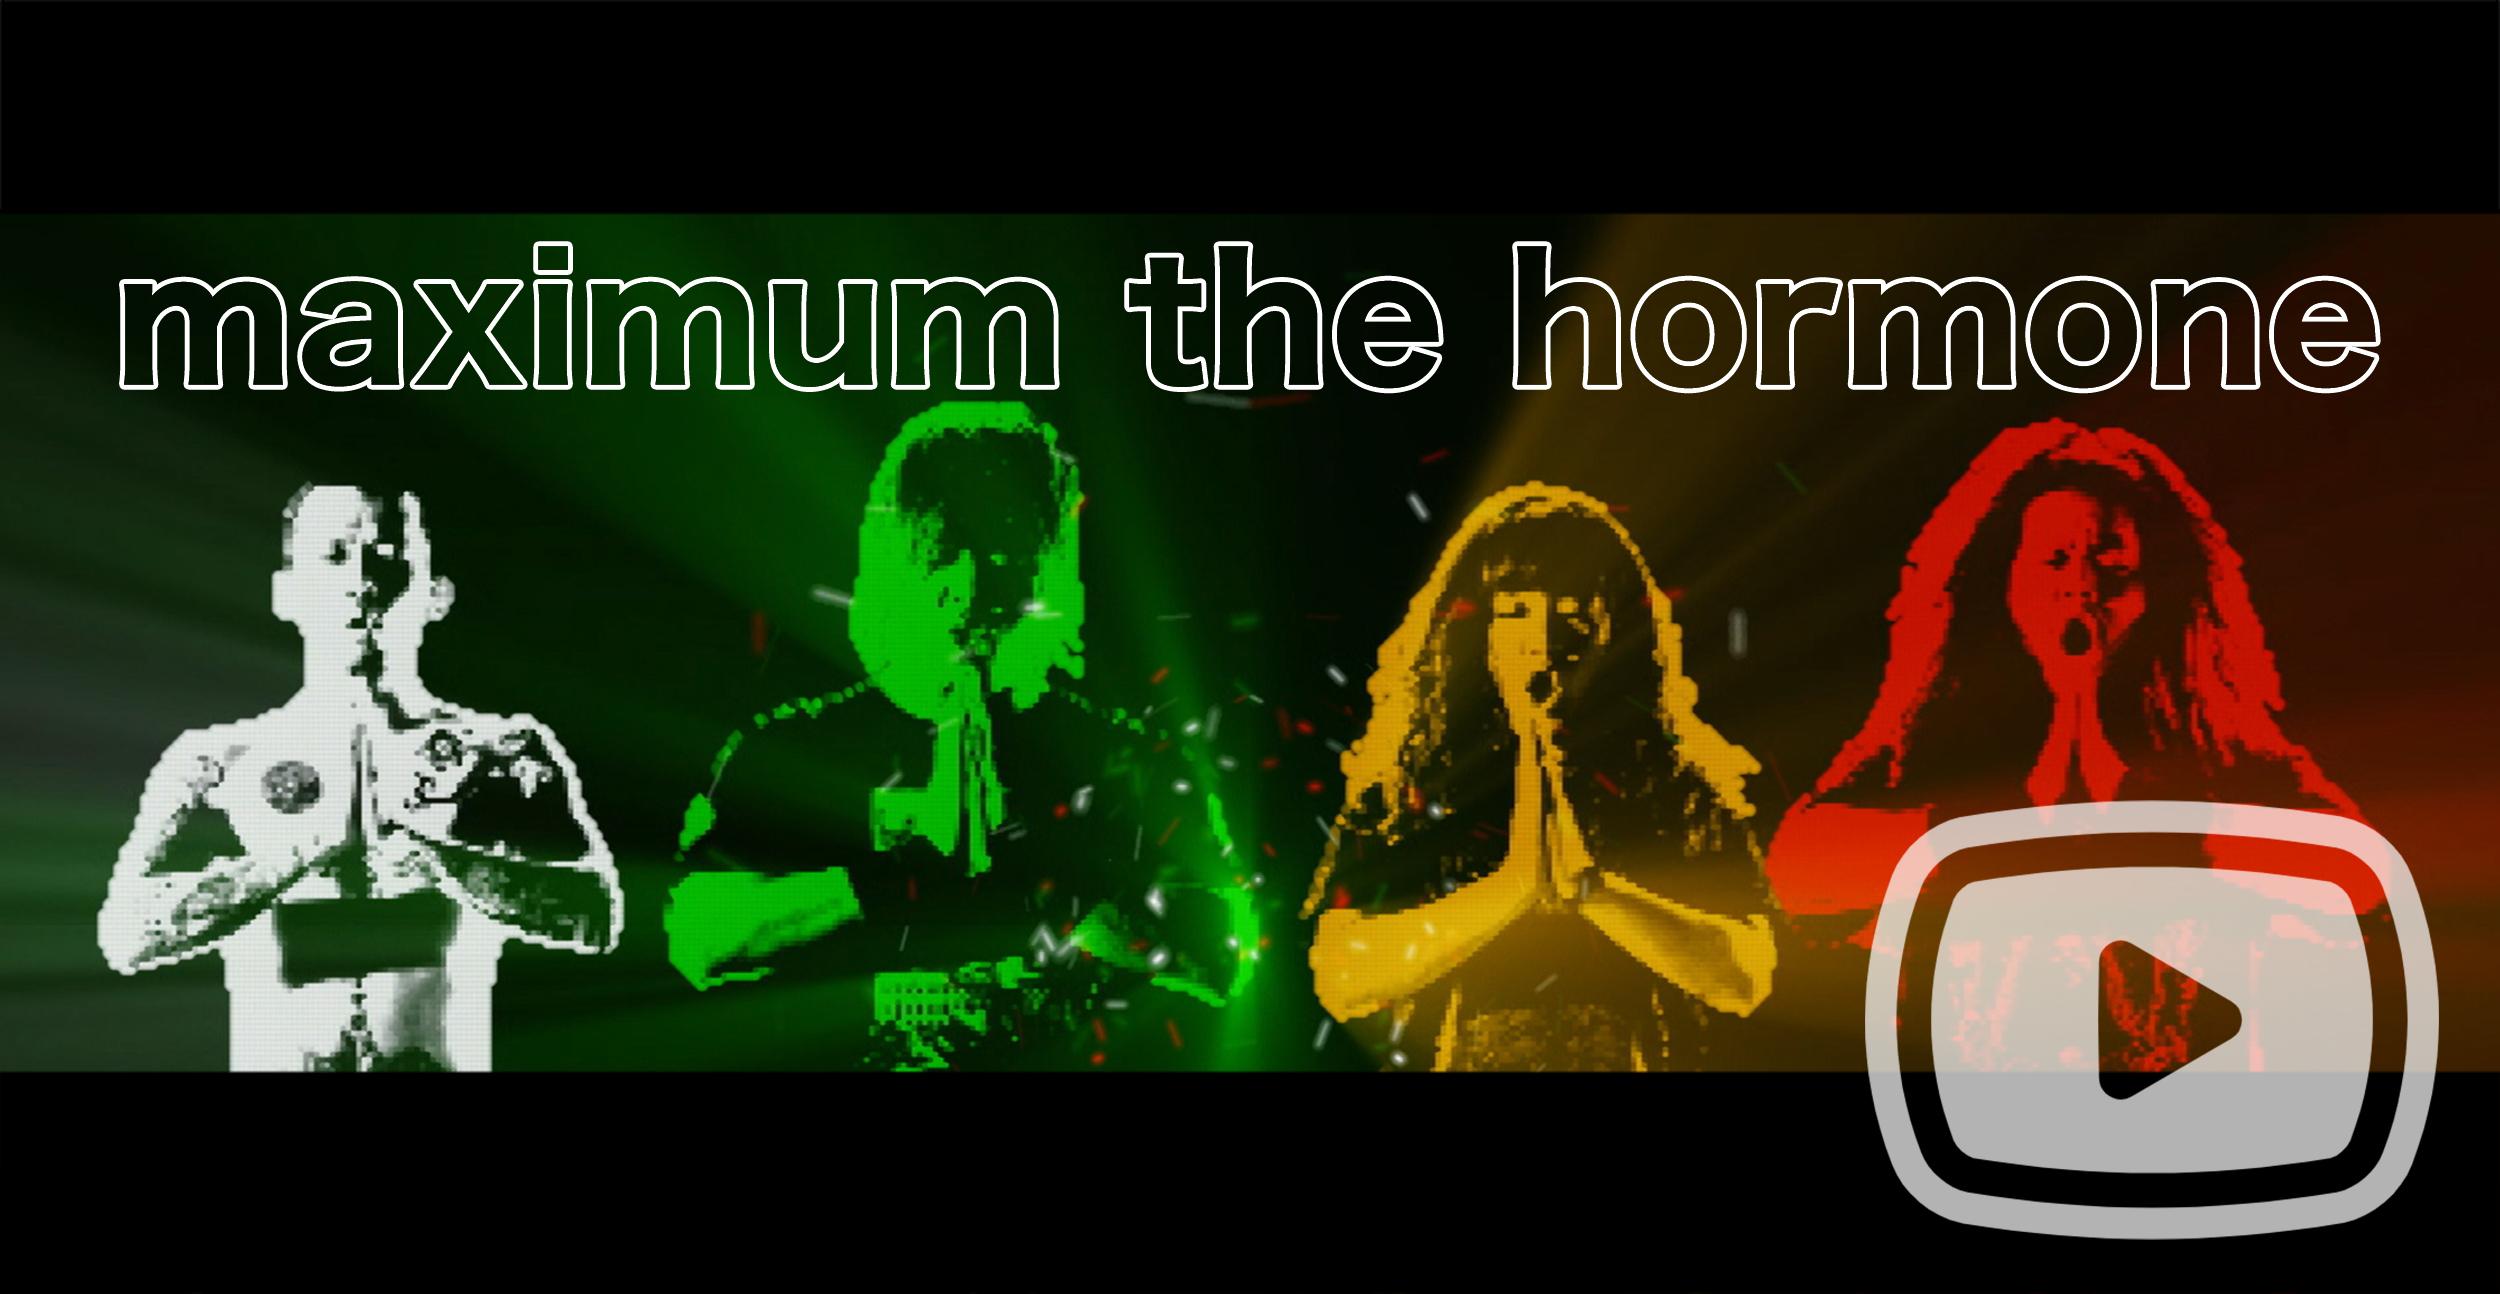 MAXIMUM THE HORMONE -Official English Website-